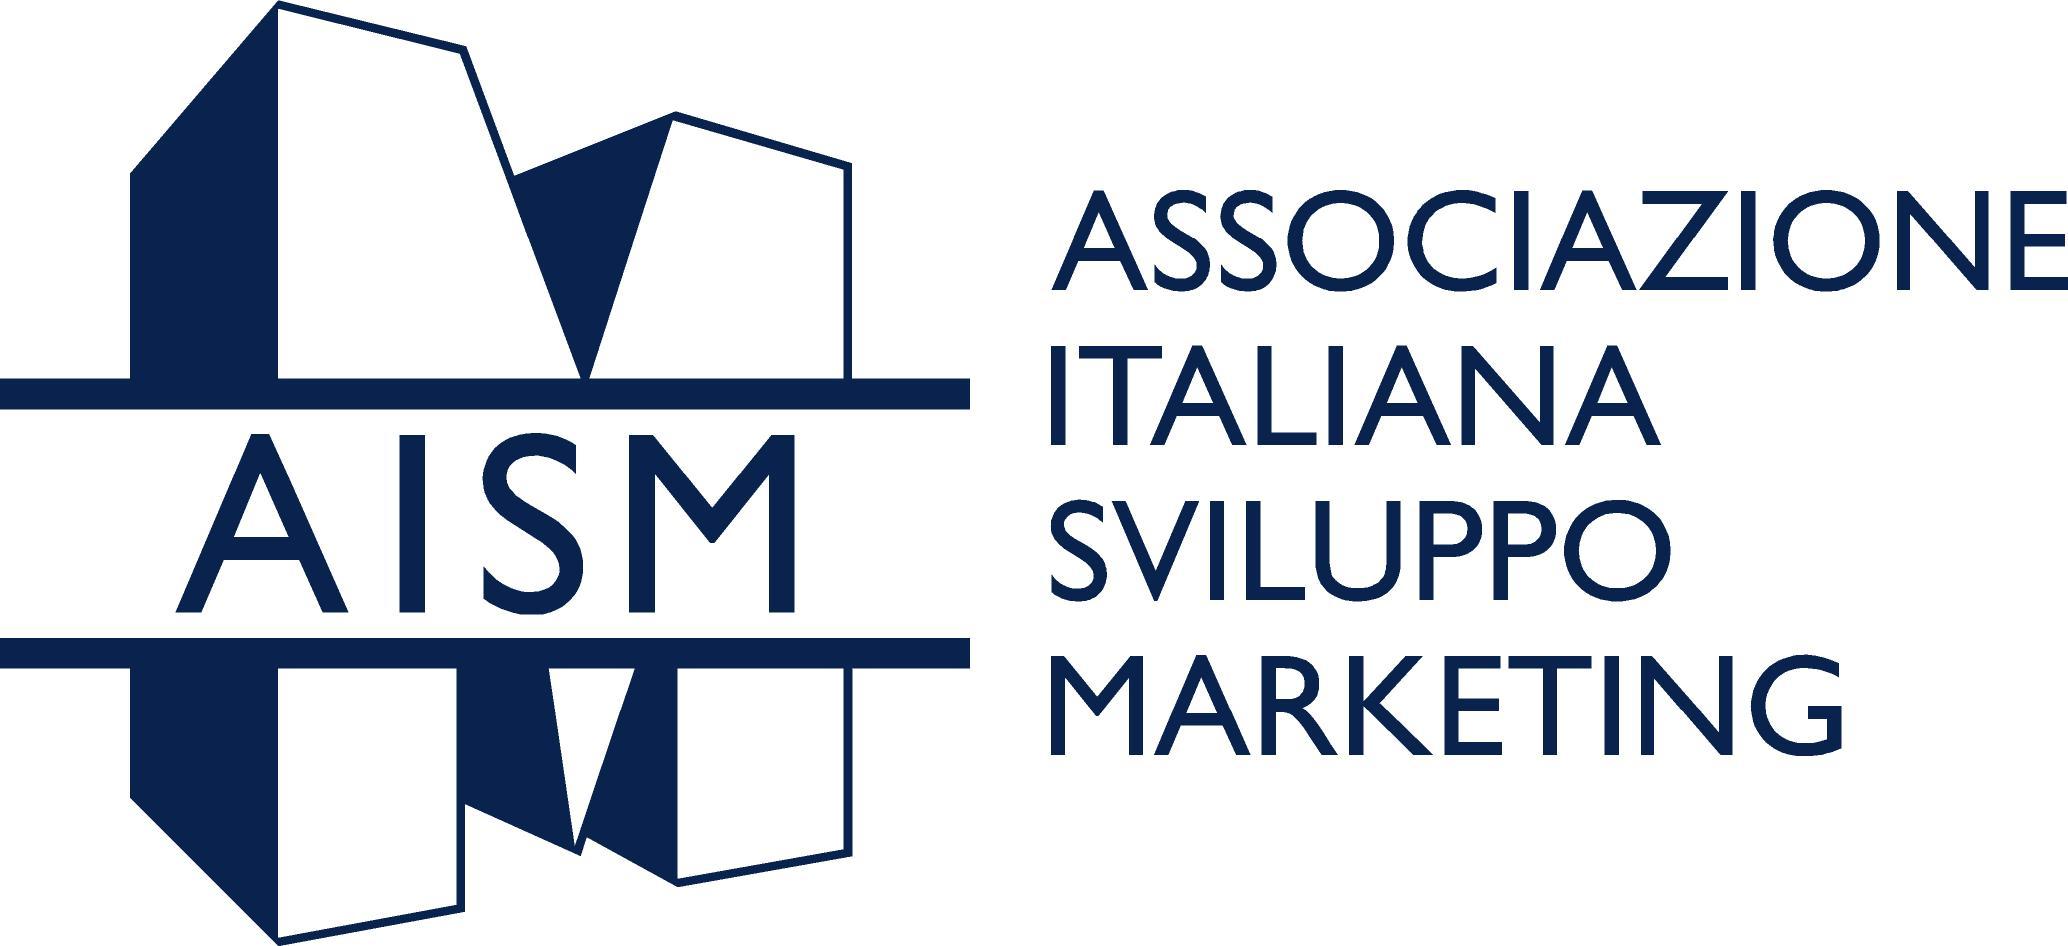 AISM - Associazione Italiana Sviluppo Marketing